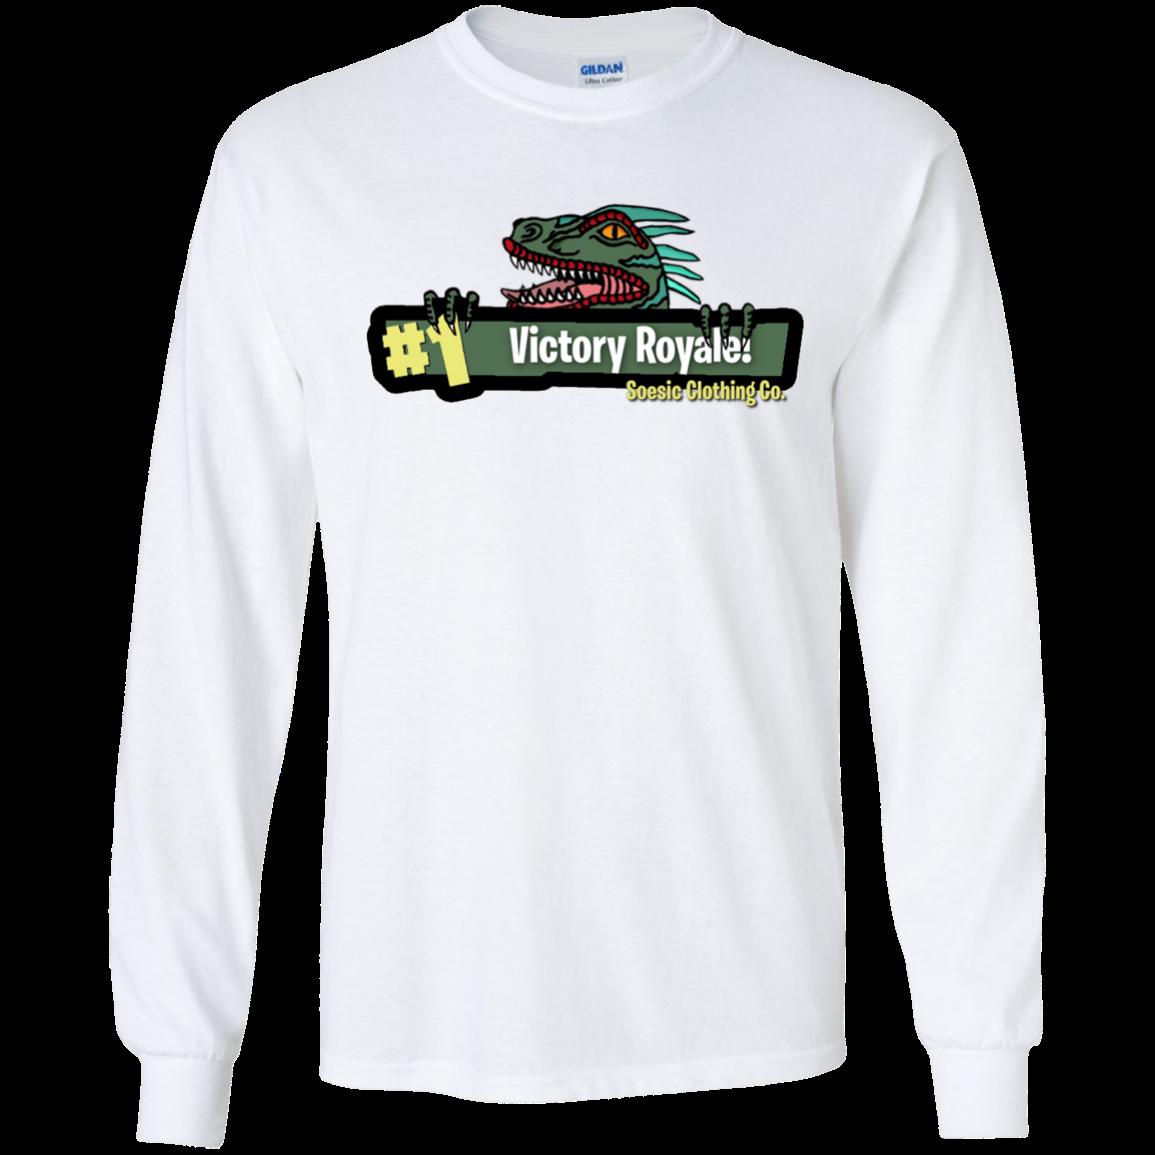 Soesic Victory Royale Fortnite Ls T Shirt Long Sleeve Tshirt Men T Shirt Shirts